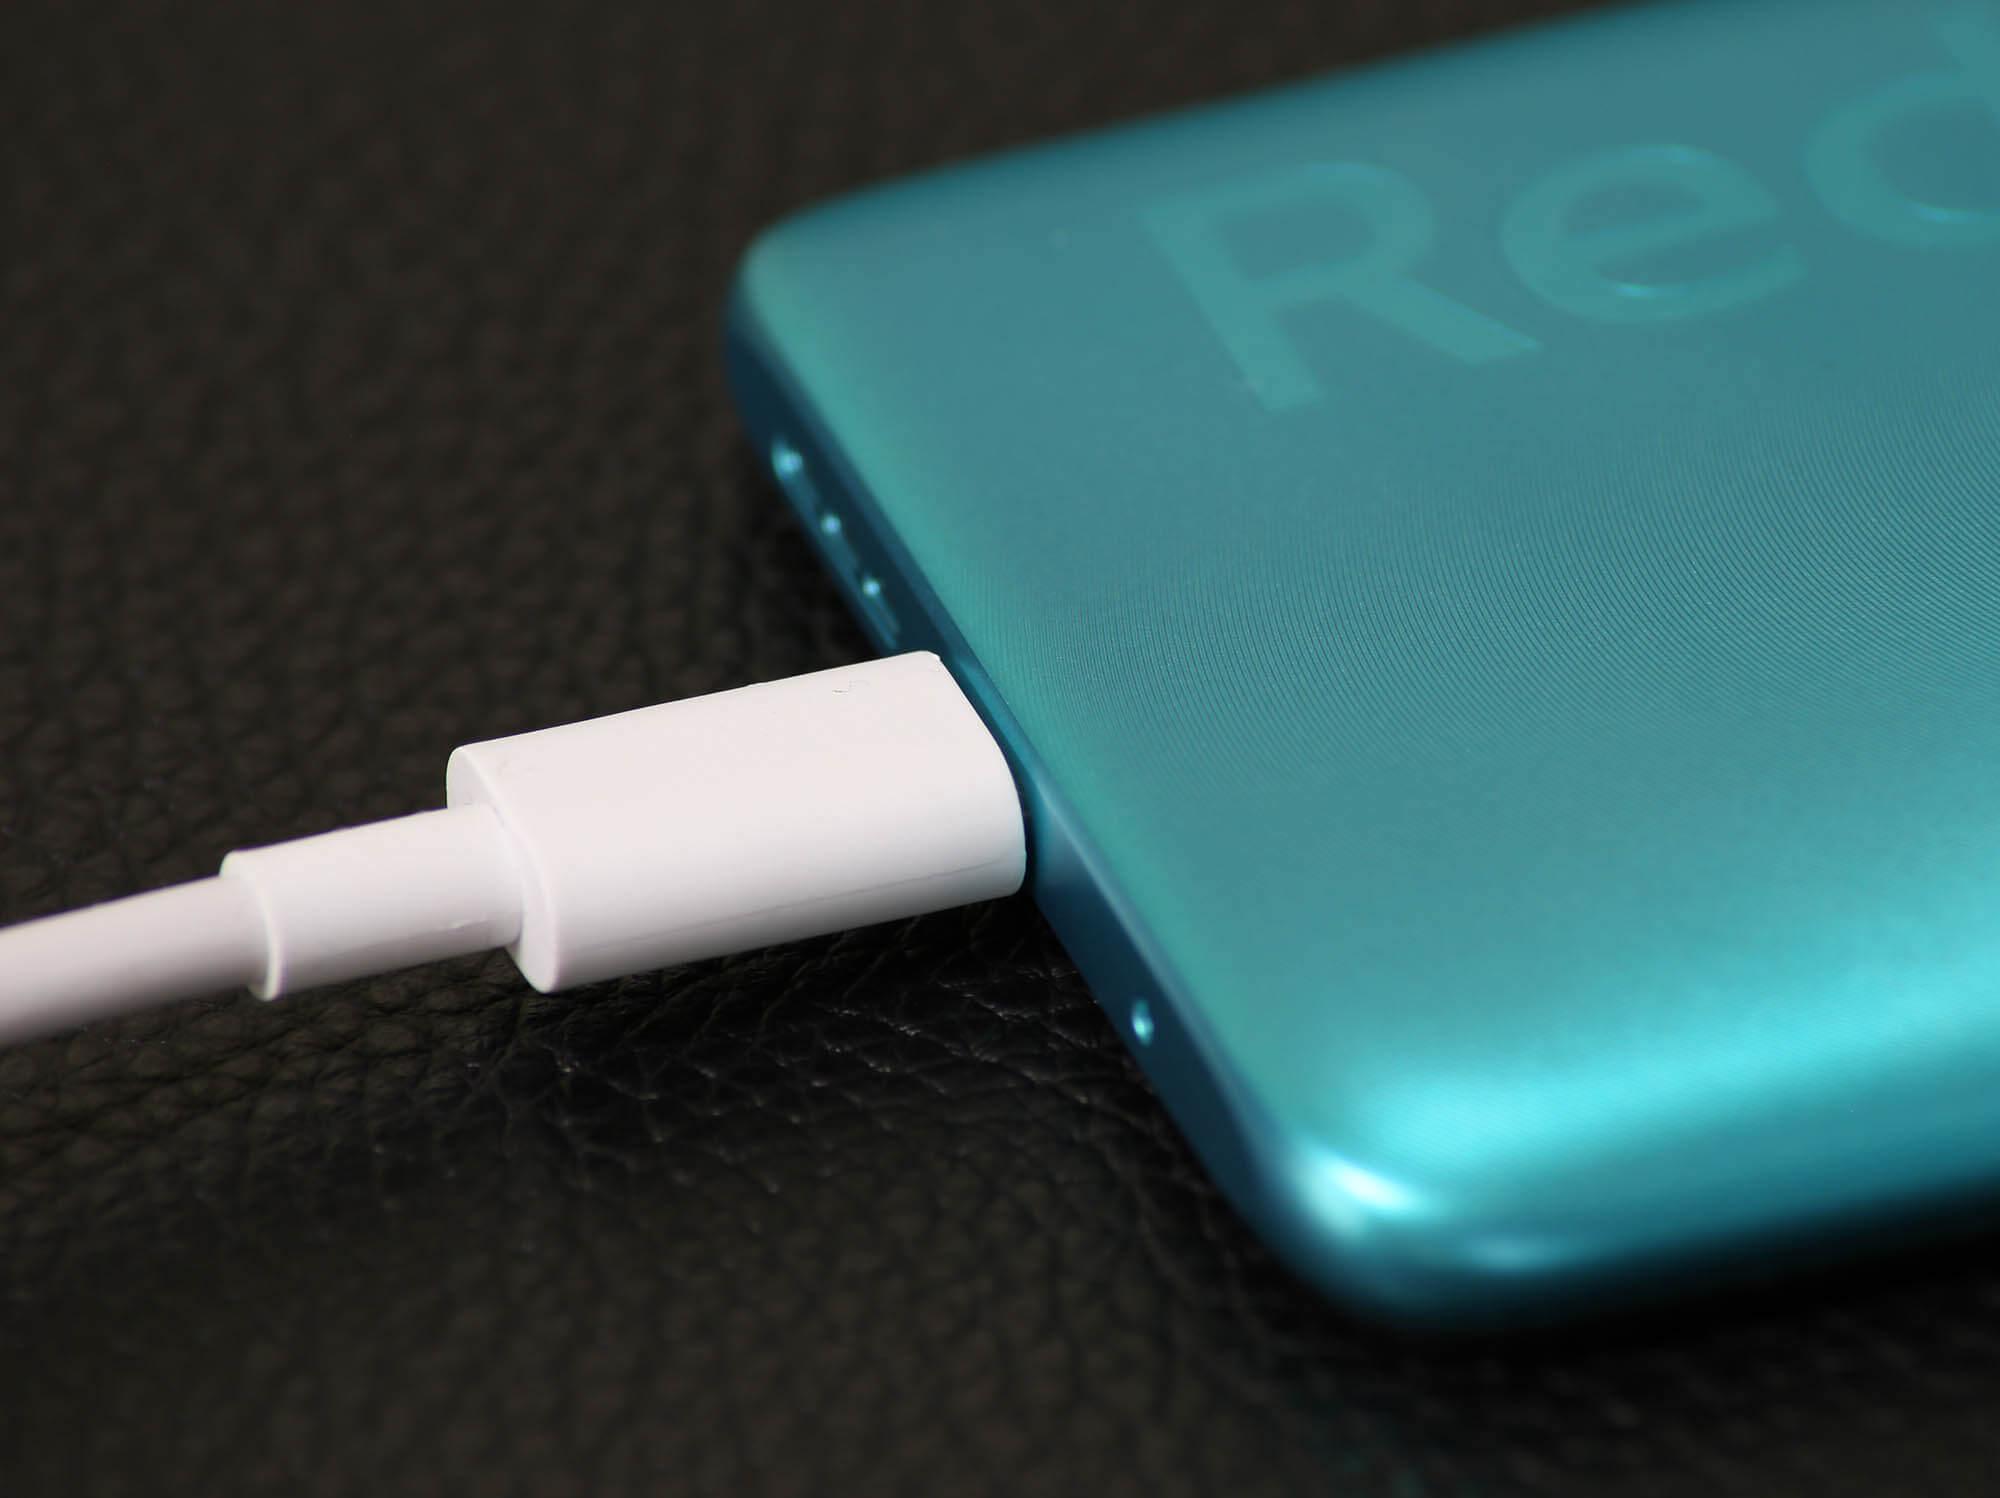 Redmi 9Tは最大18Wの急速充電に対応